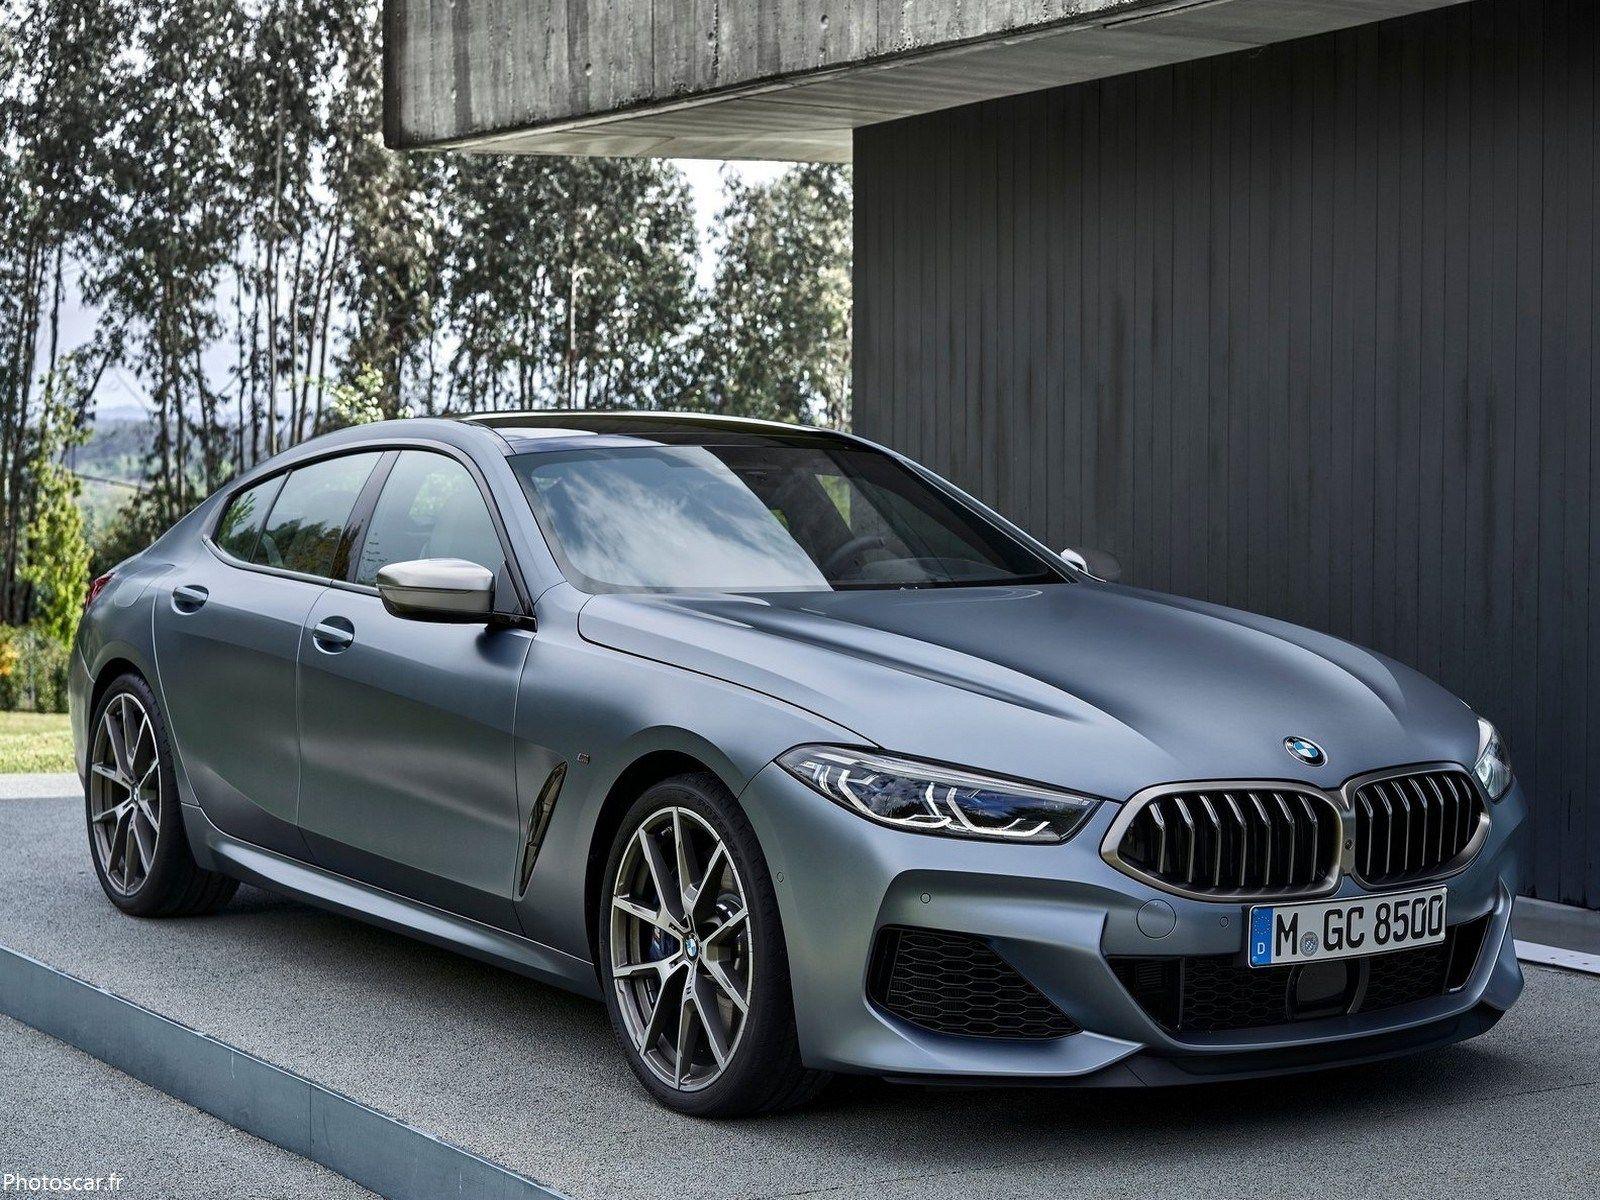 Bmw Serie 8 Gran Coupe 2020 Sera Disponible Dans Les Versions I6 Et V8 Bmw 8 Series Gran Coupe Bmw M850i 2020 Bmw